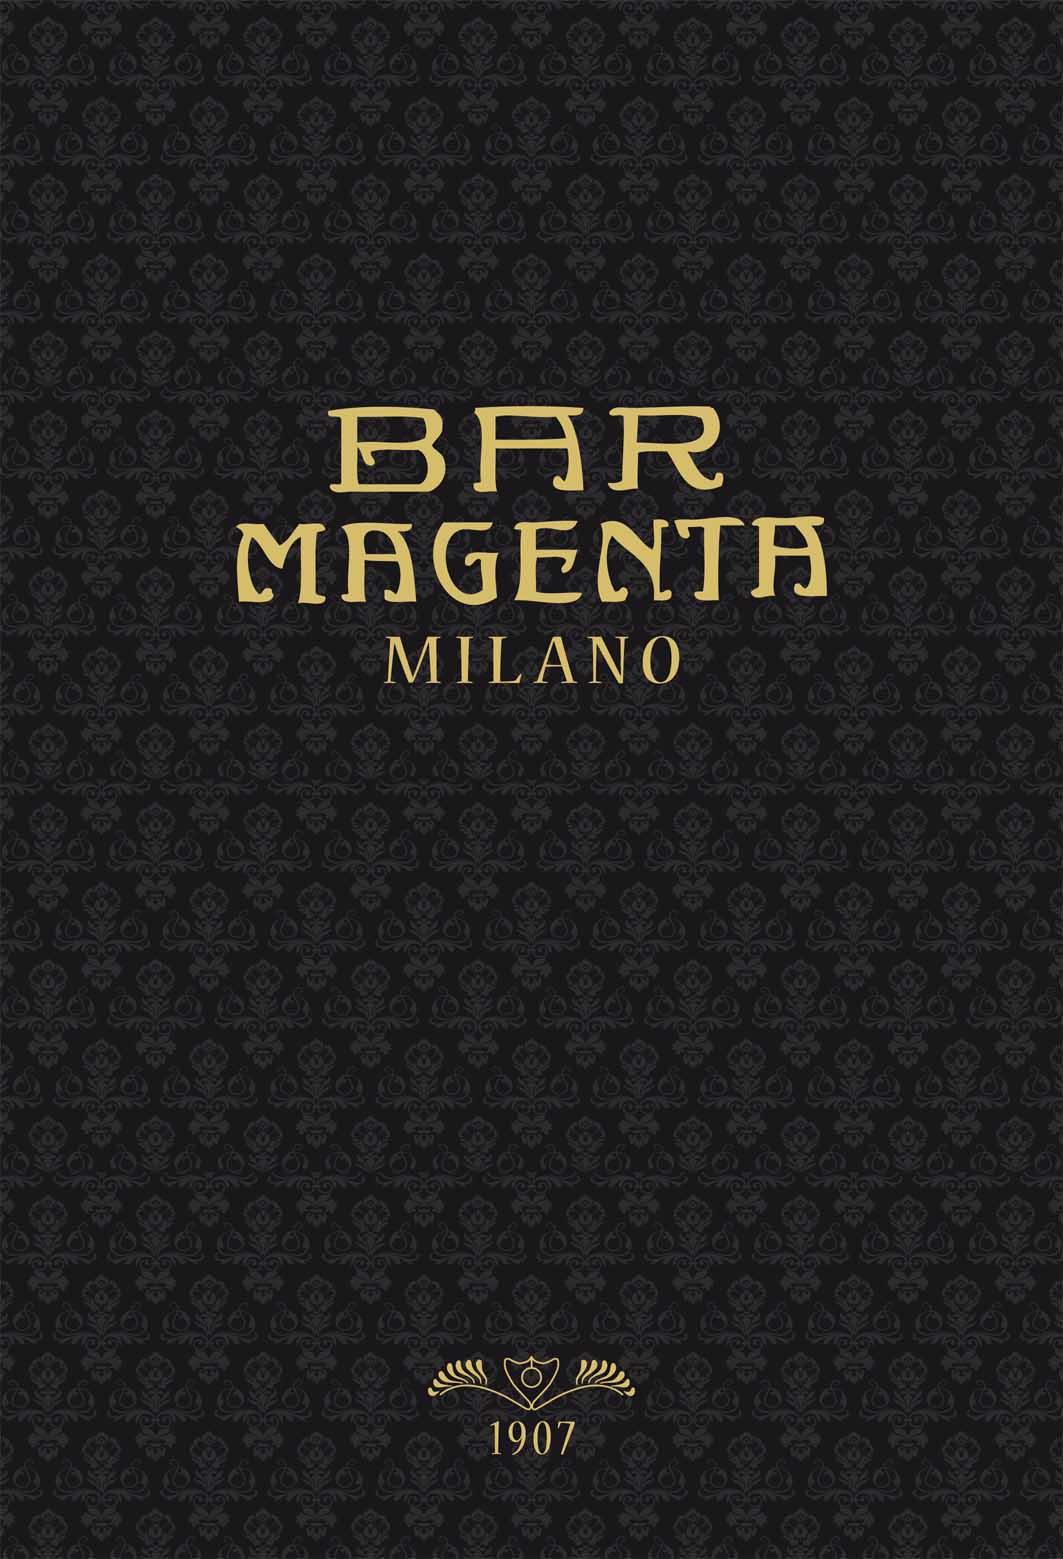 www.barmagenta.it